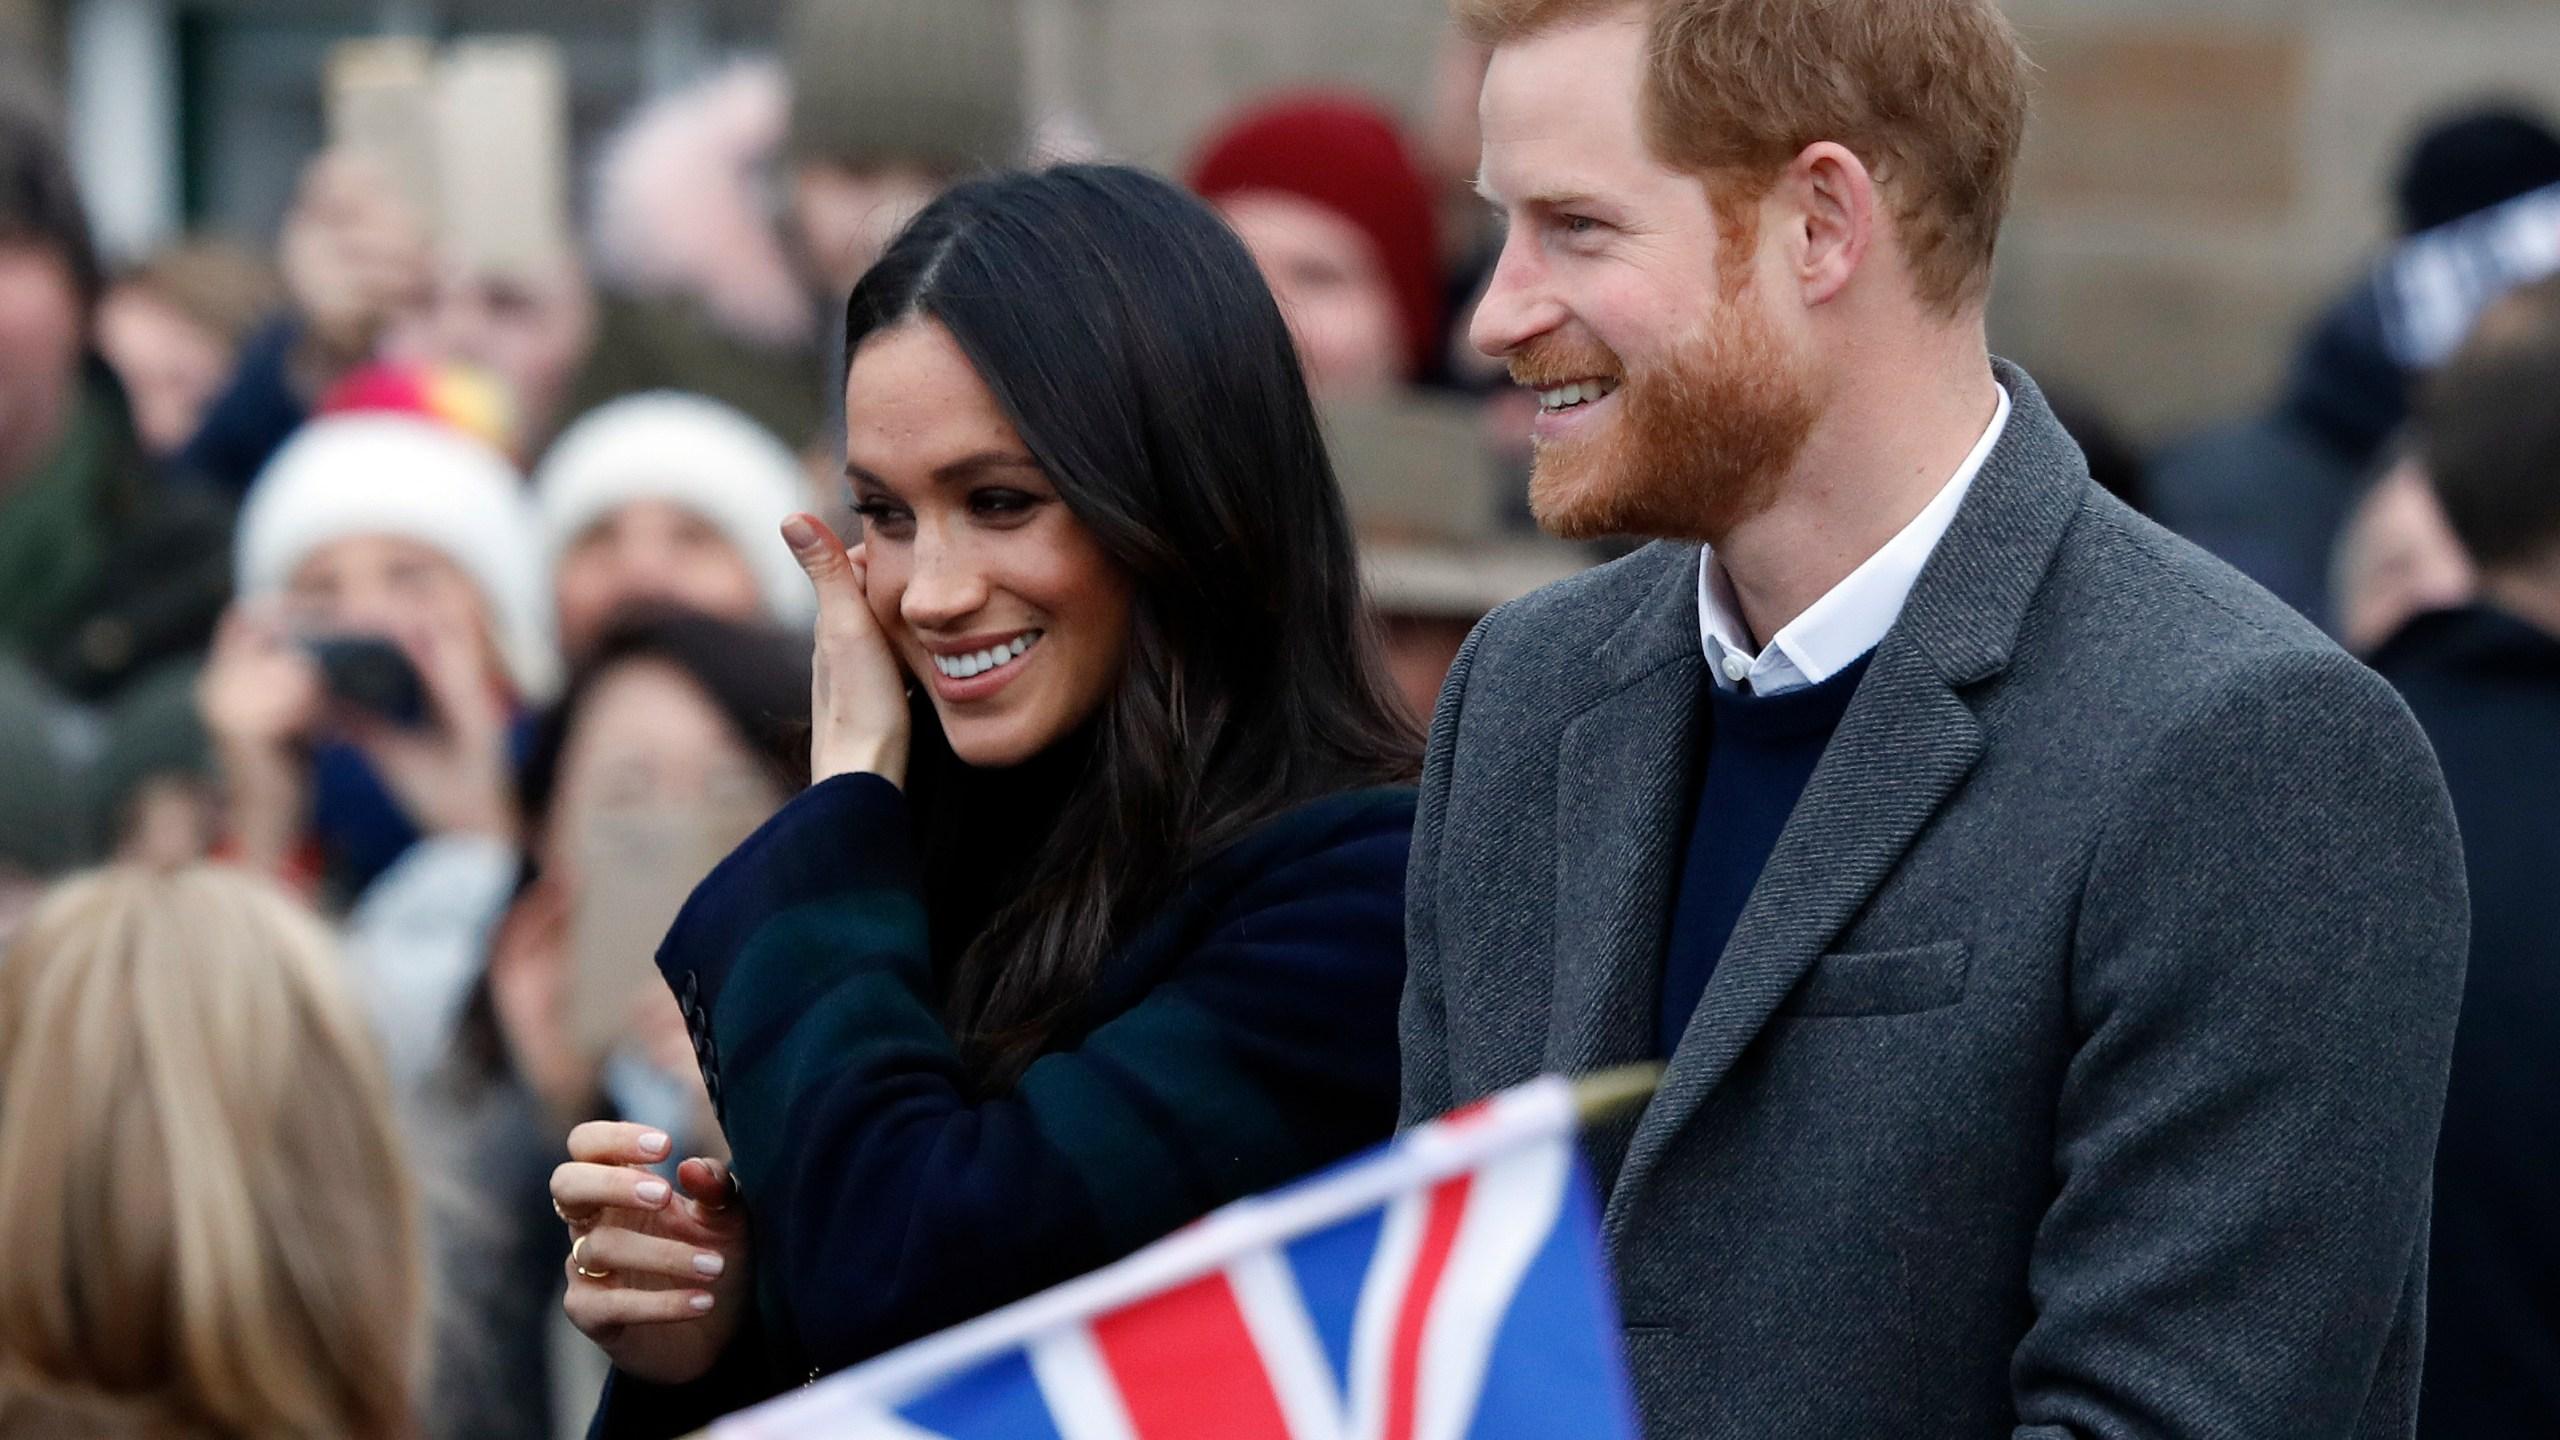 Britain_Royals_94215-159532.jpg92258066